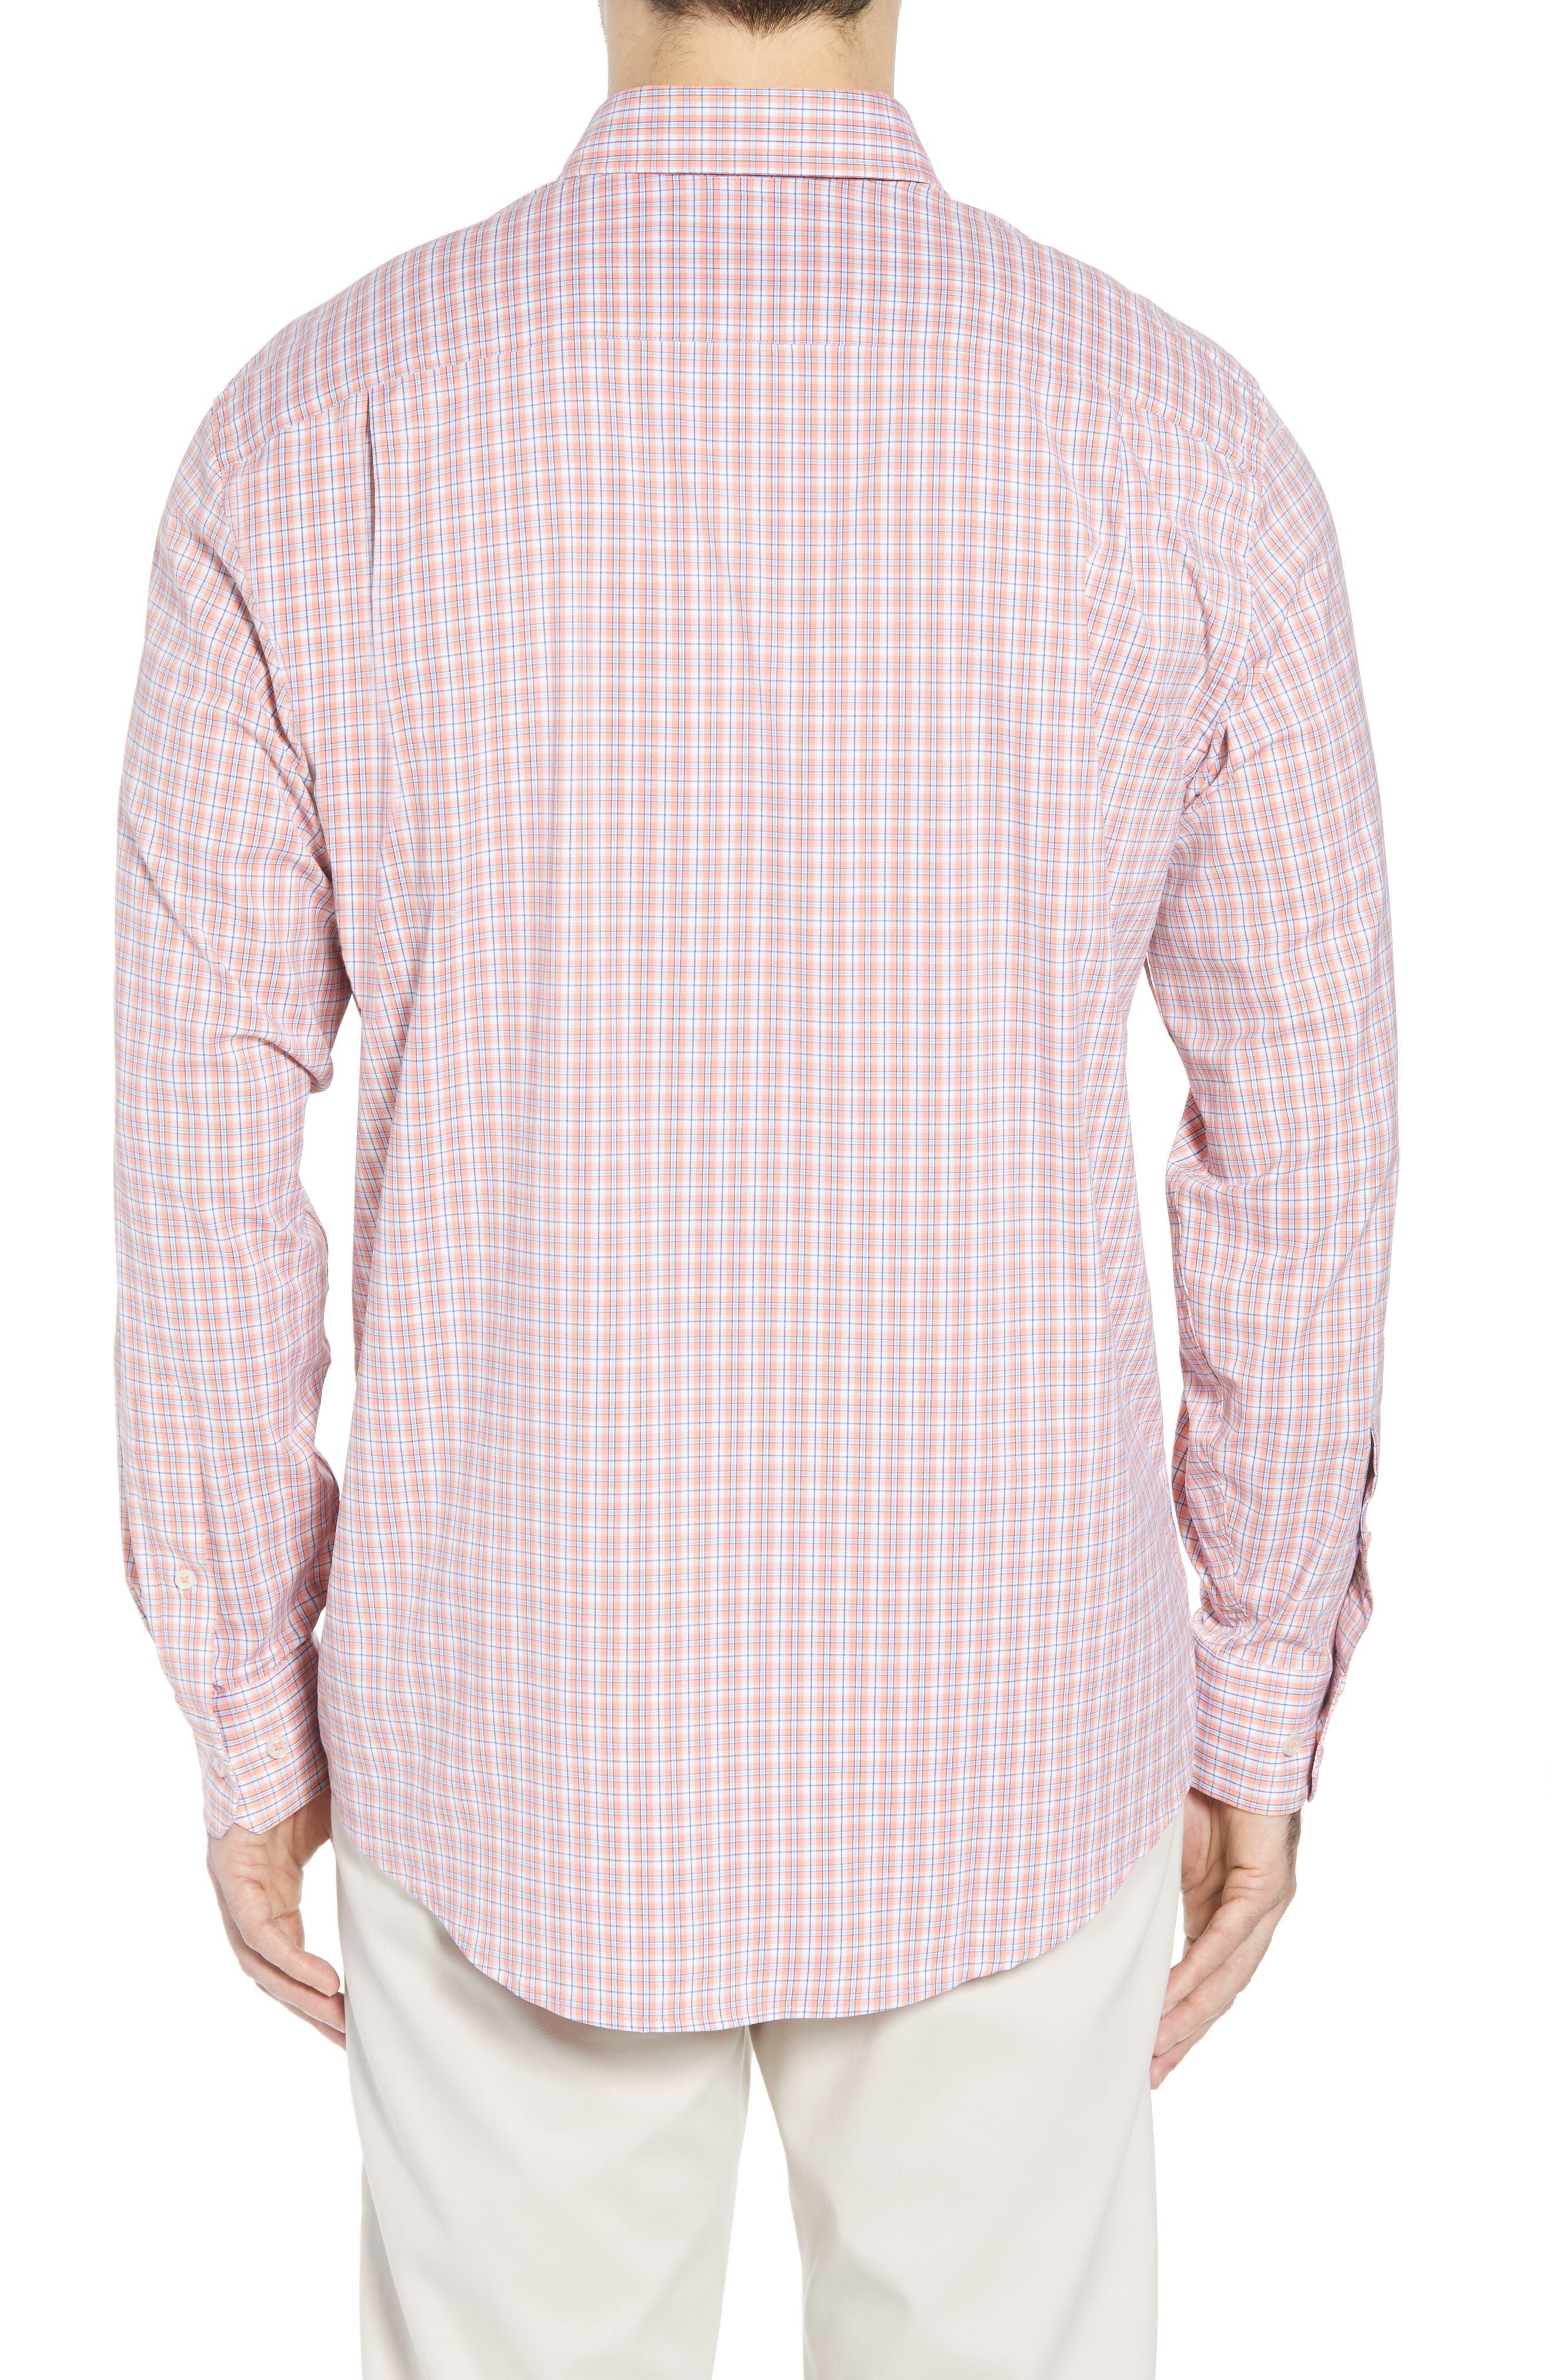 Grand Turk Regular Fit Stretch Plaid Sport Shirt,                             Alternate thumbnail 2, color,